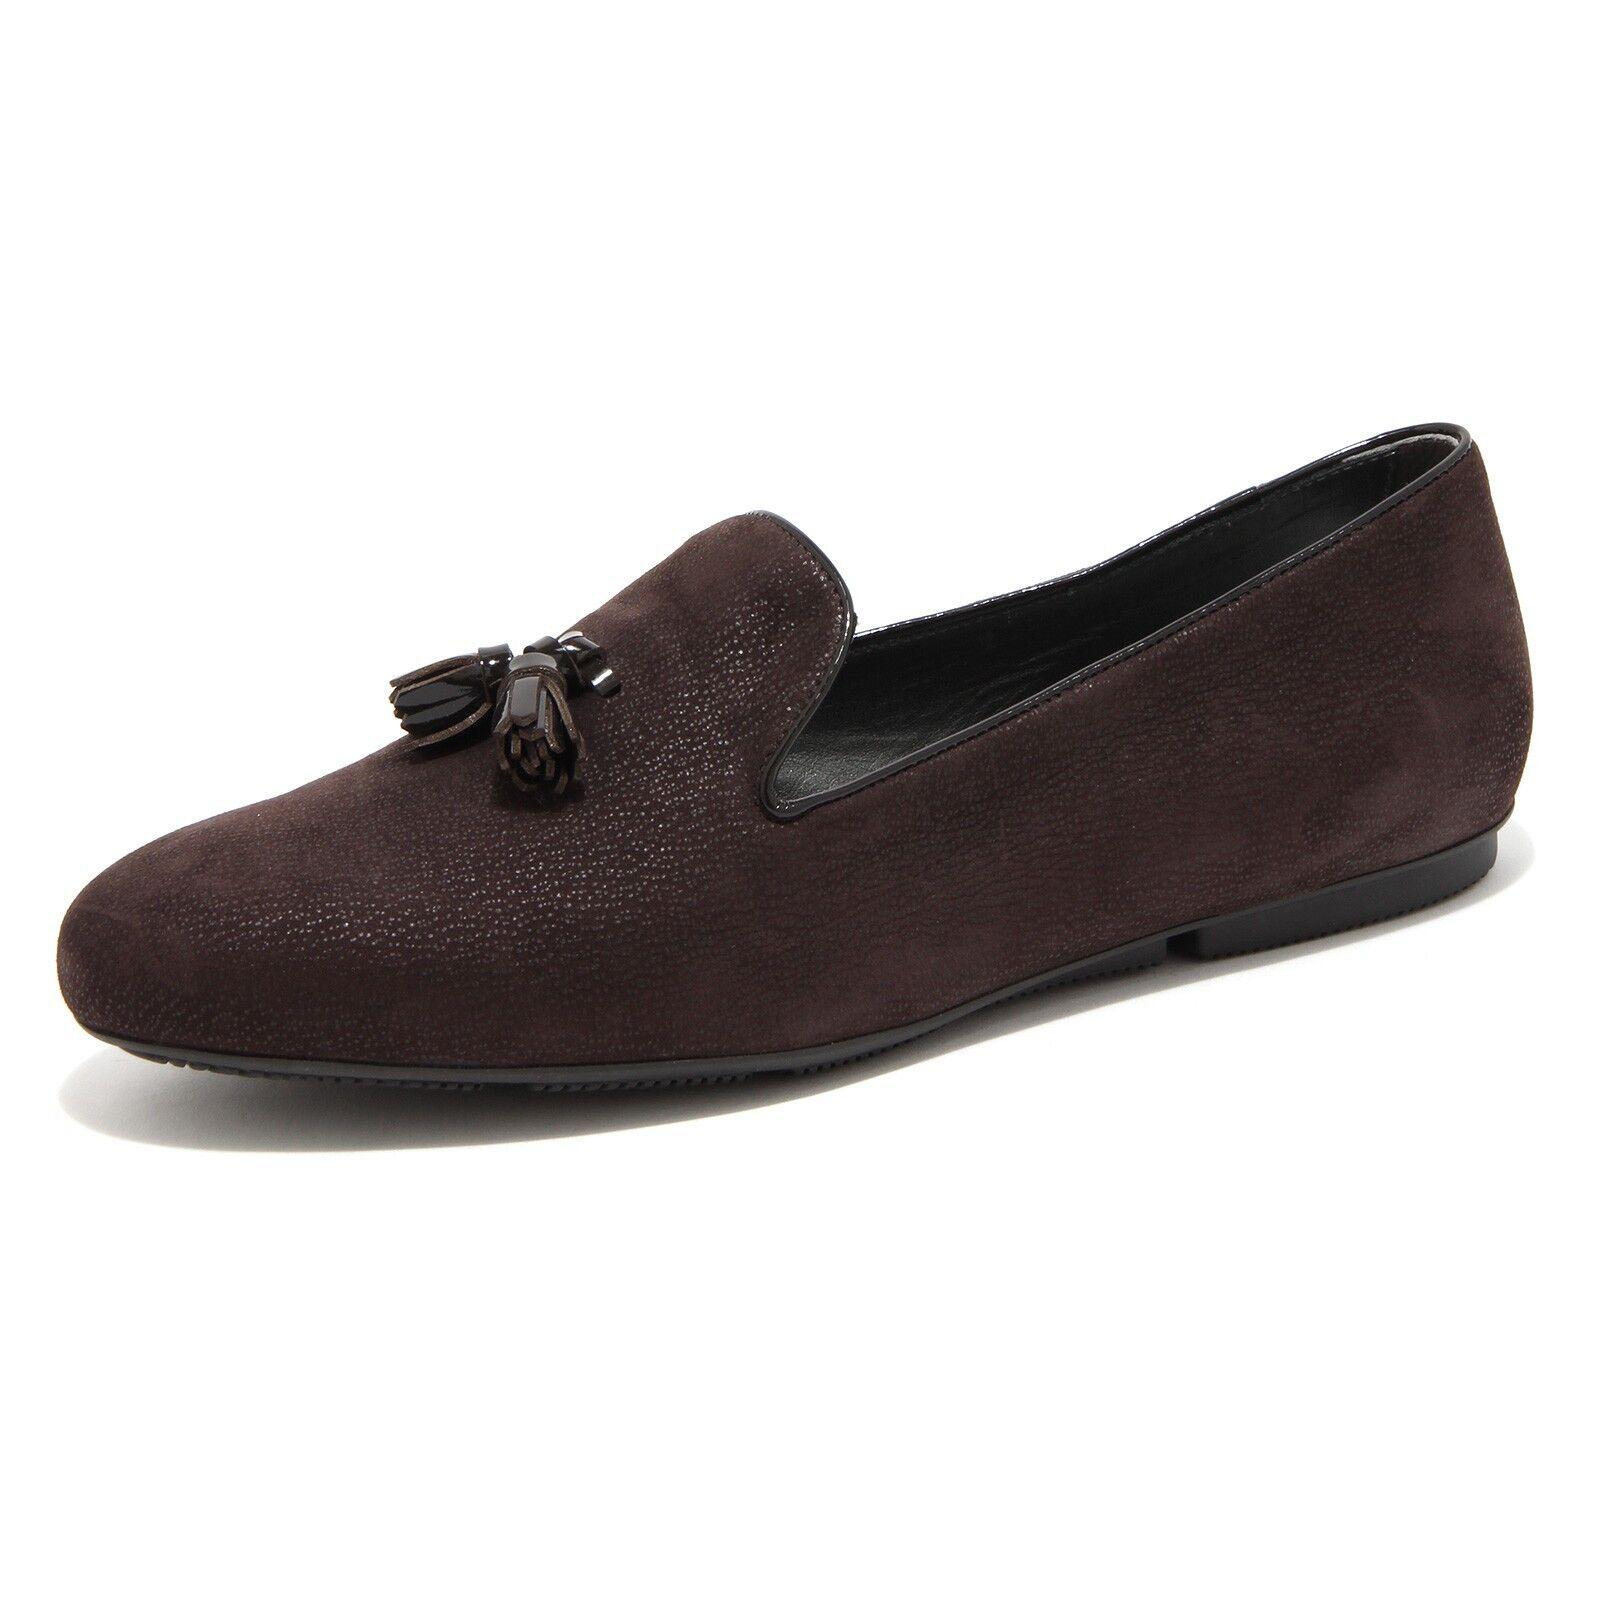 82526 mocassino HOGAN  PANTOFOLA NAPPINE scarpa donna loafer shoes